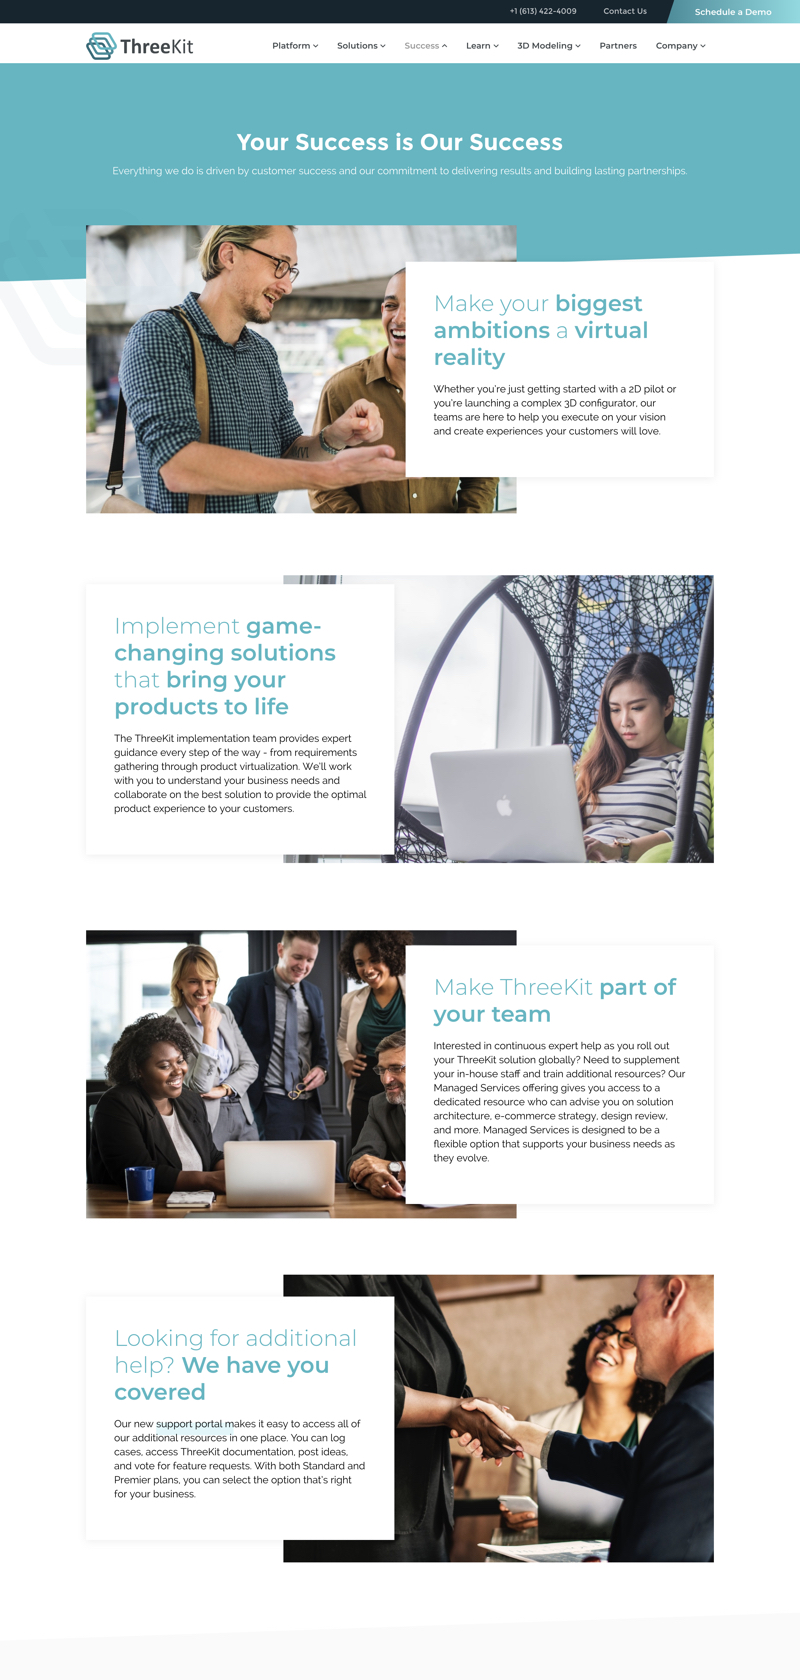 ThreeKit website design